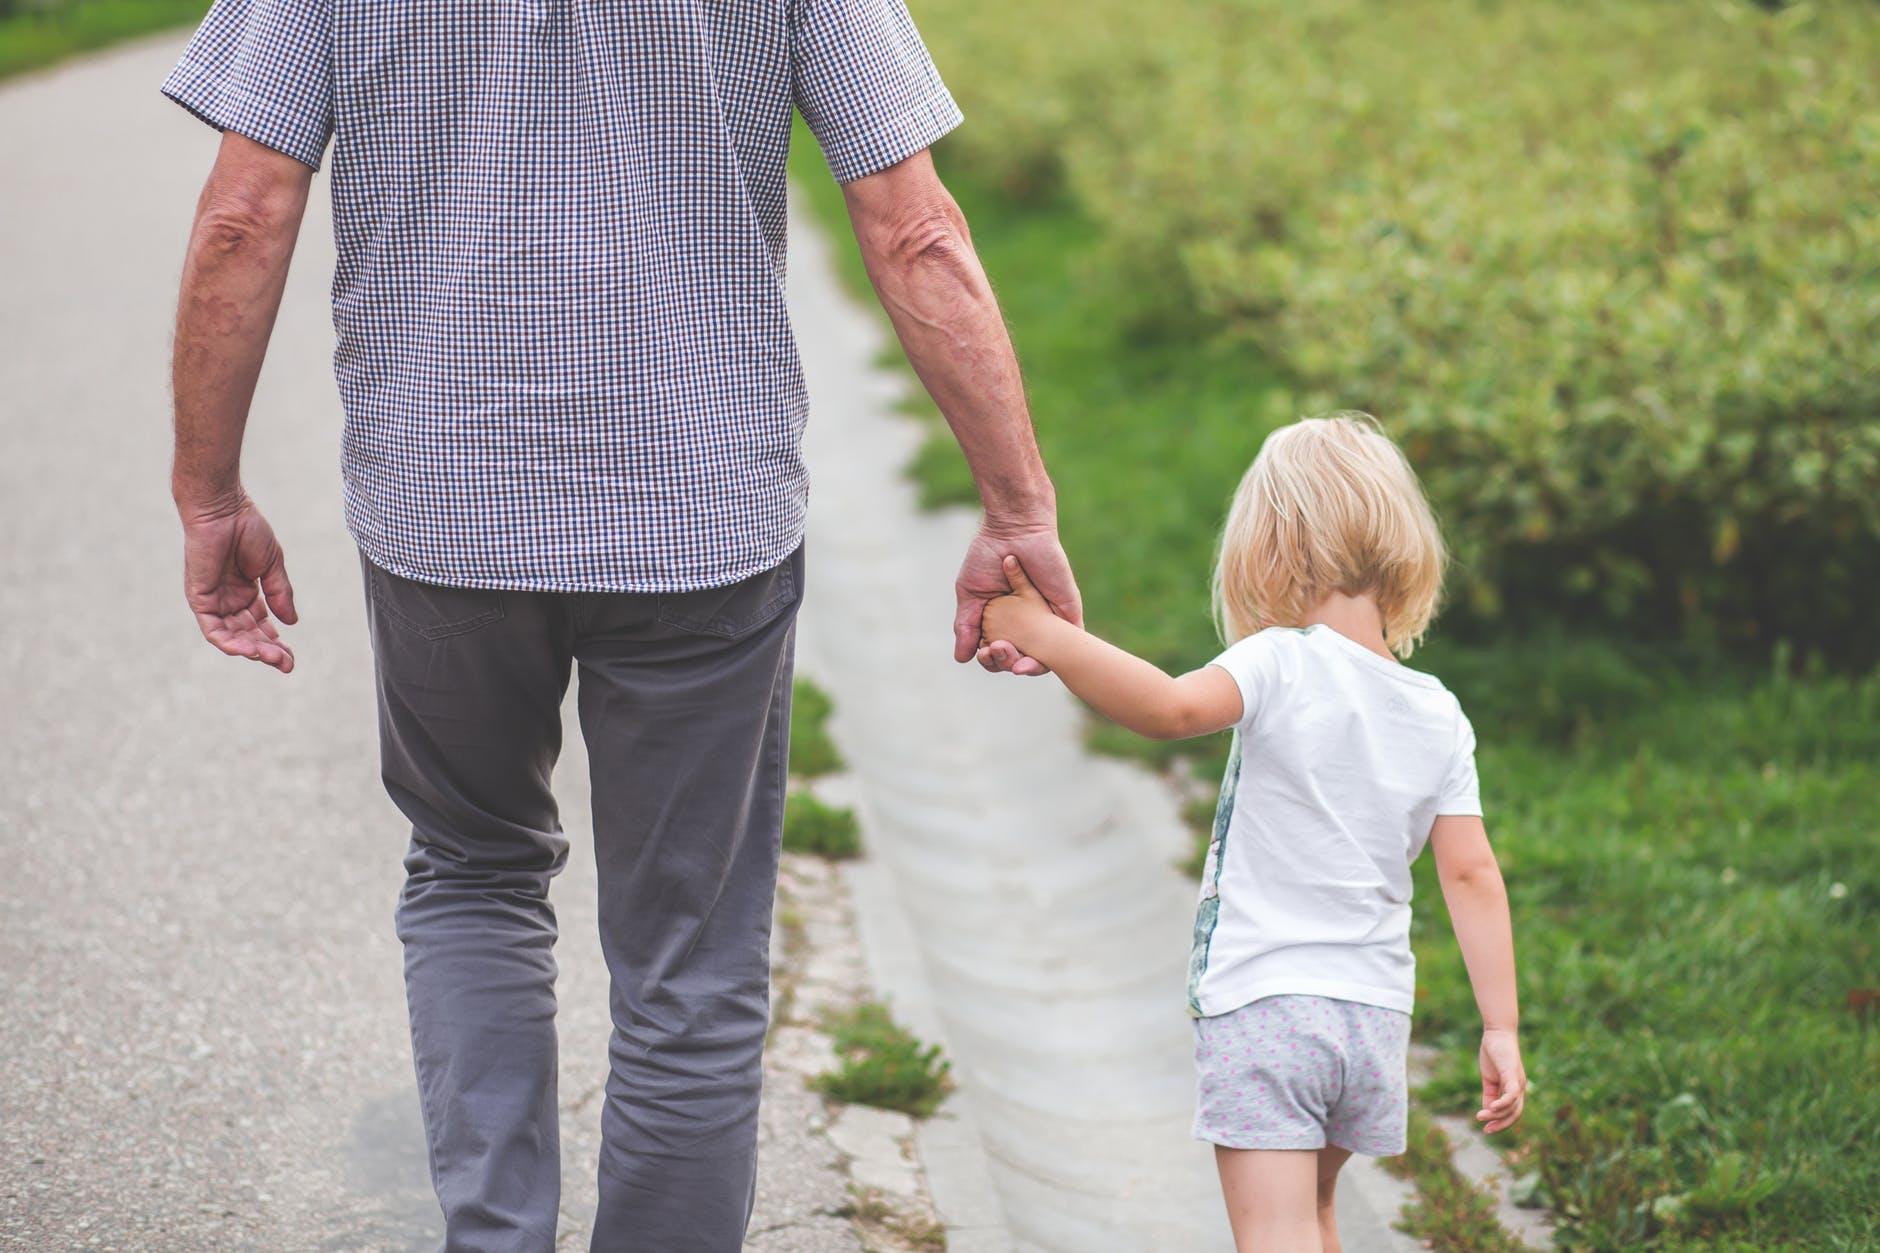 man and child walking near bushes during daytime